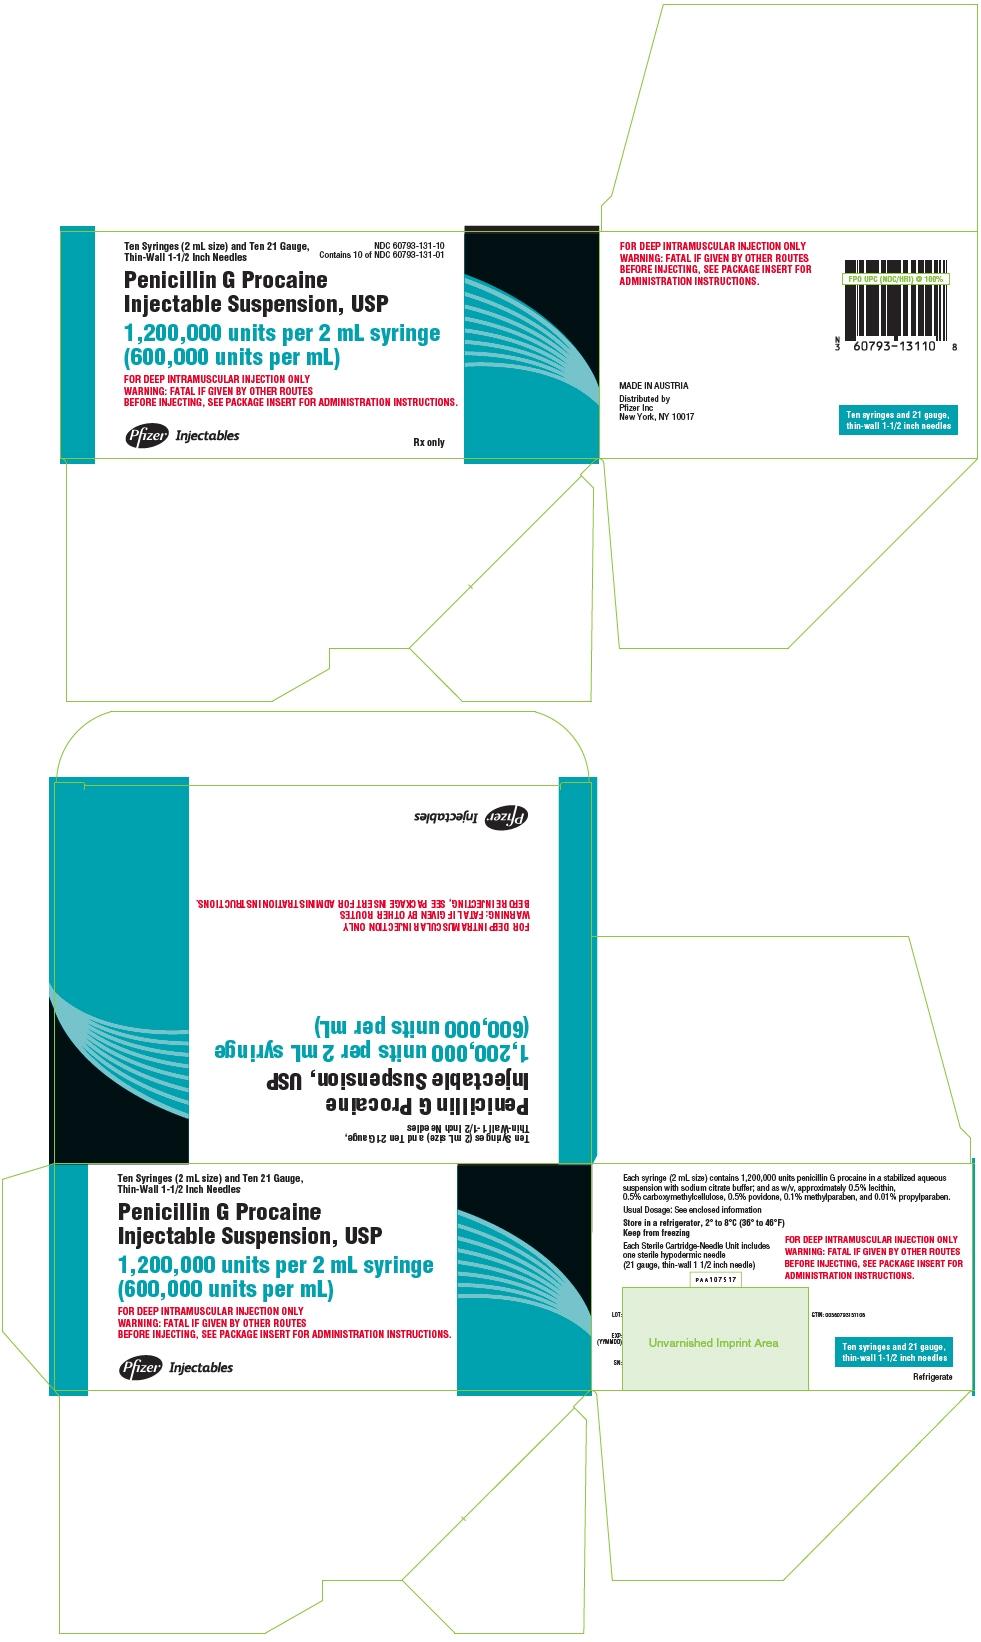 PRINCIPAL DISPLAY PANEL - 2 mL Syringe Package